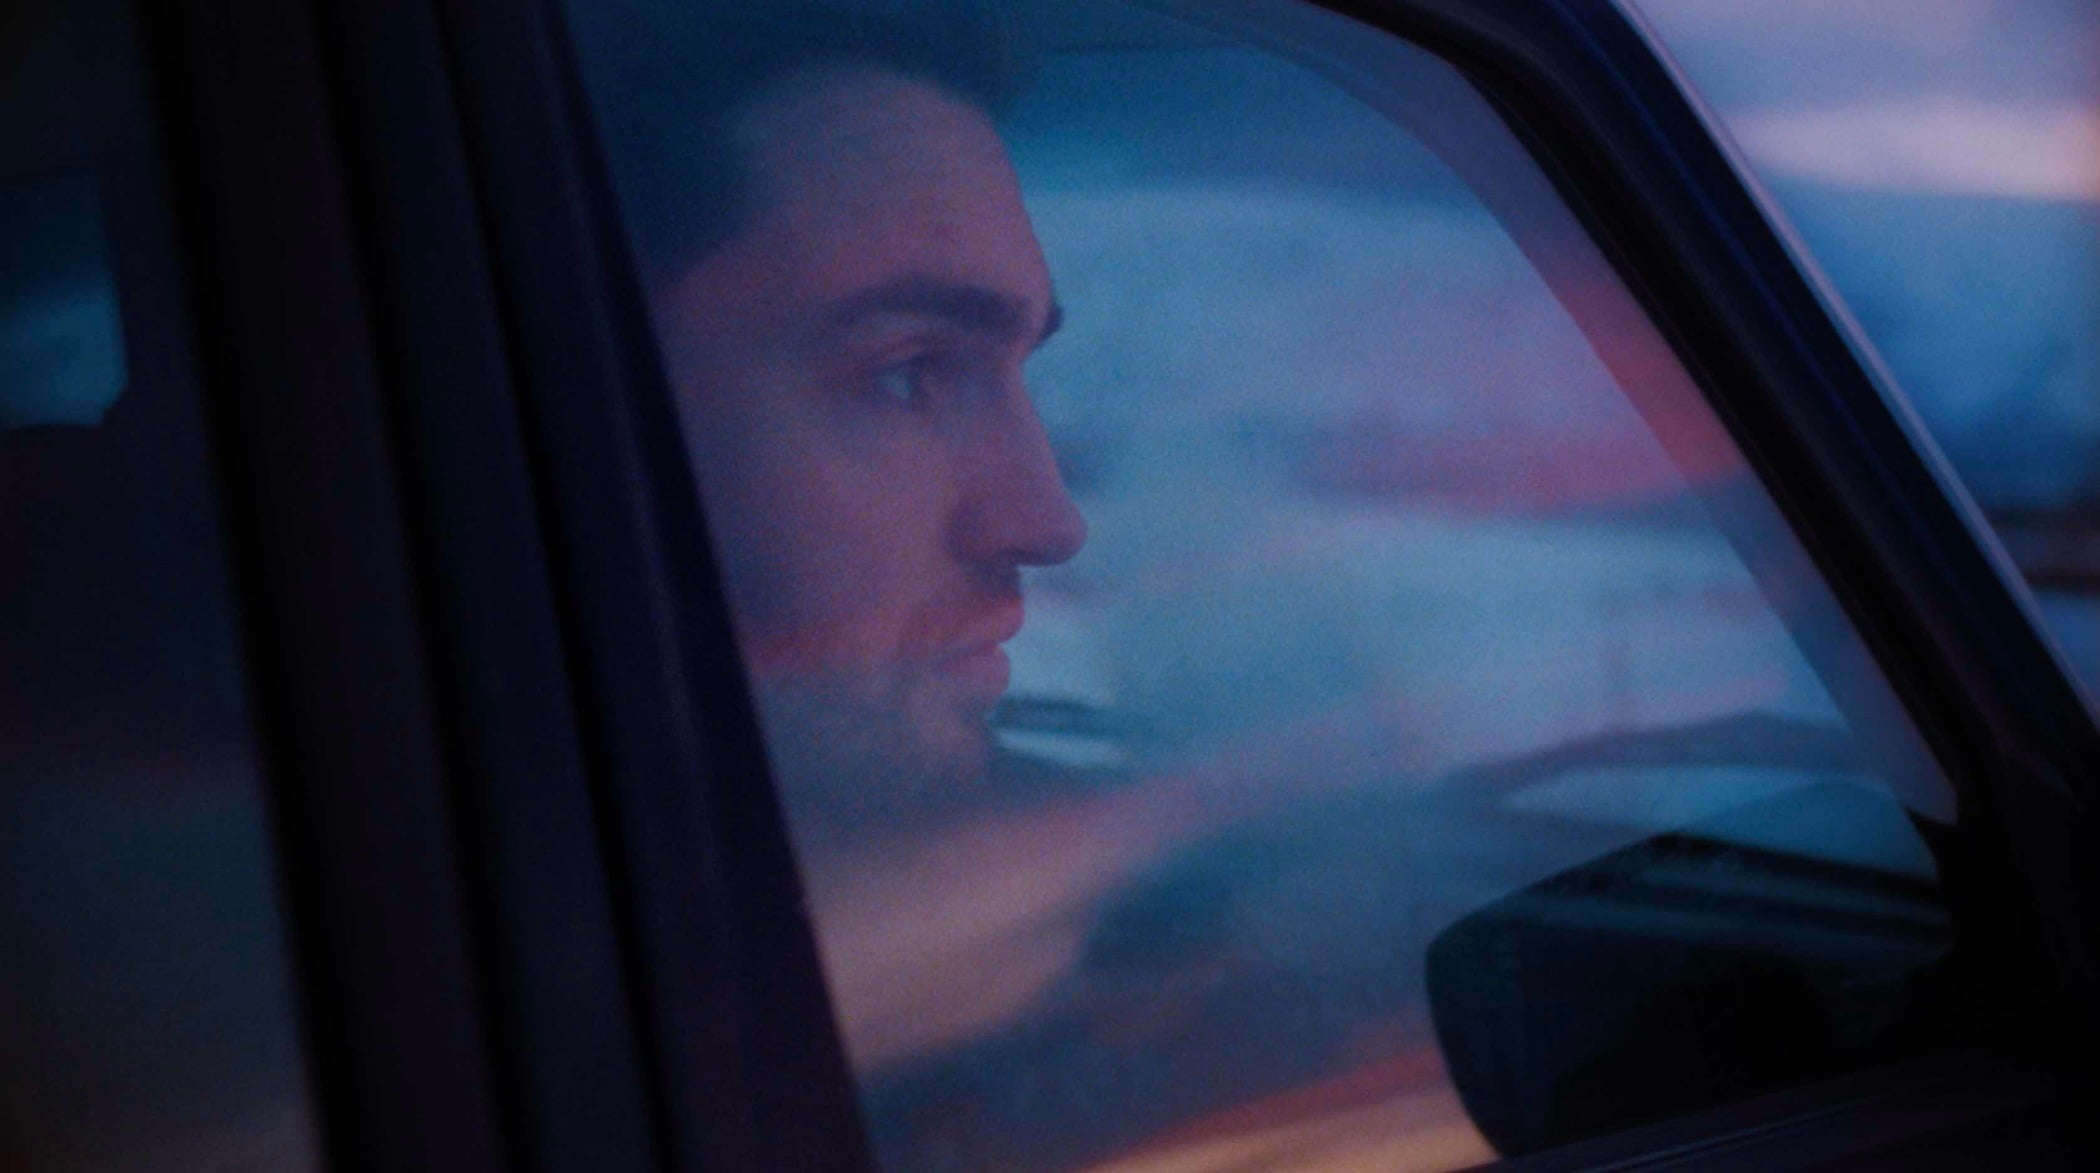 Automotive lighting, Motor vehicle, Rear-view mirror, Car